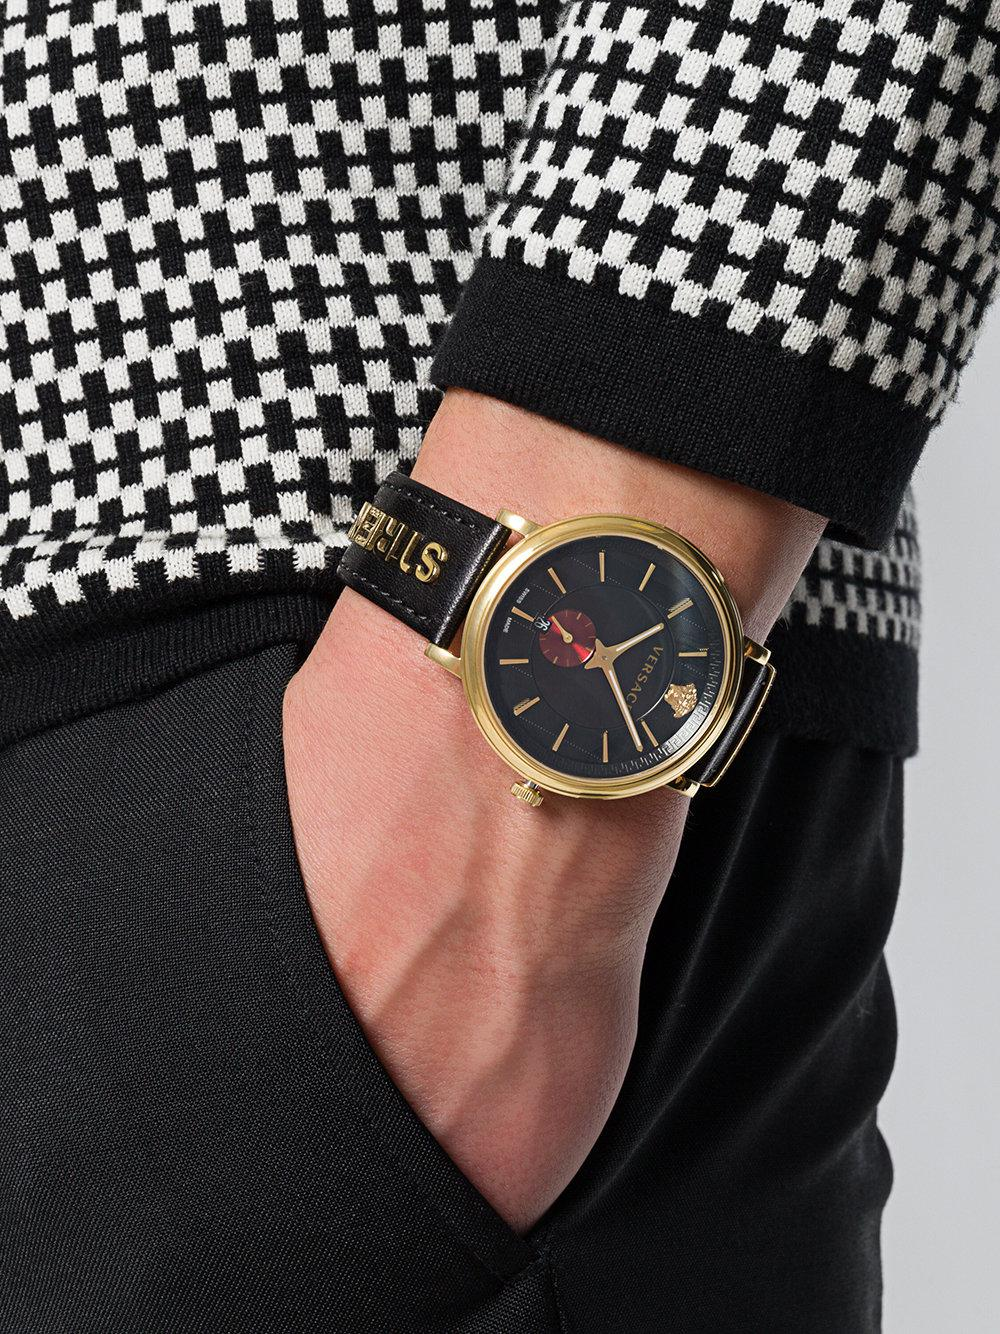 97abe76e49 Lyst - Versace V-circle Manifesto Watch in Black for Men